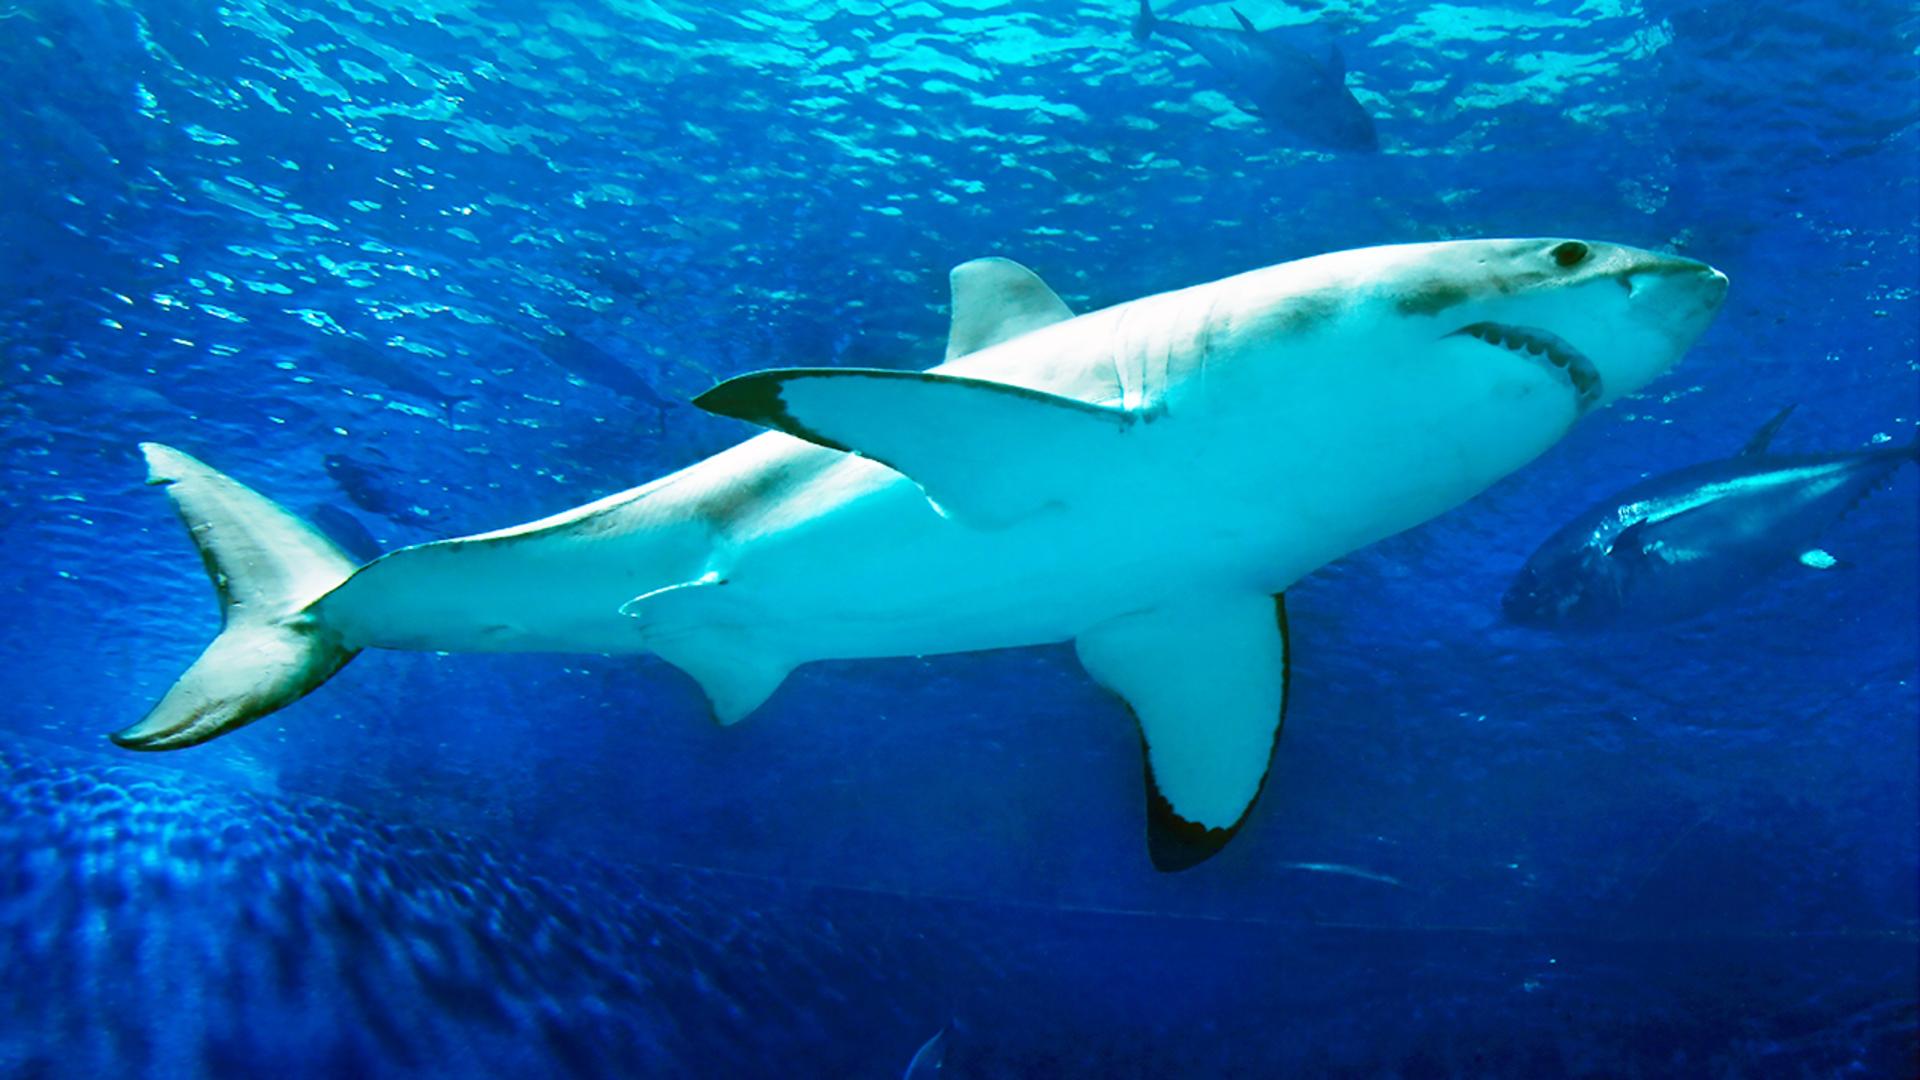 Researchers net crucial estimate of white shark survival